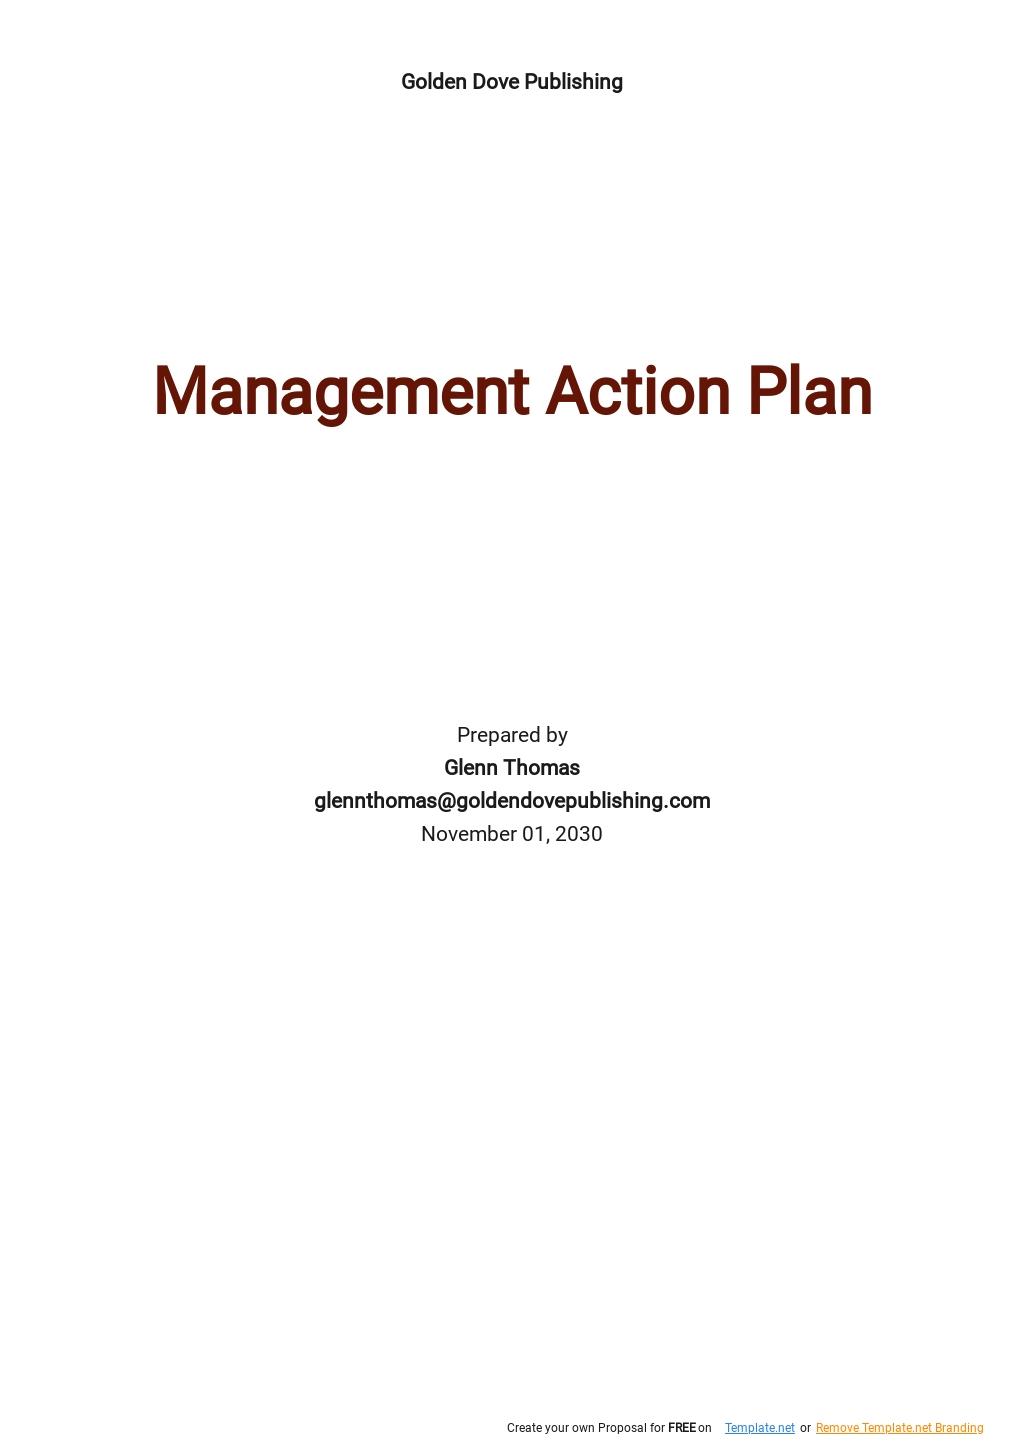 Management Action Plan Template.jpe